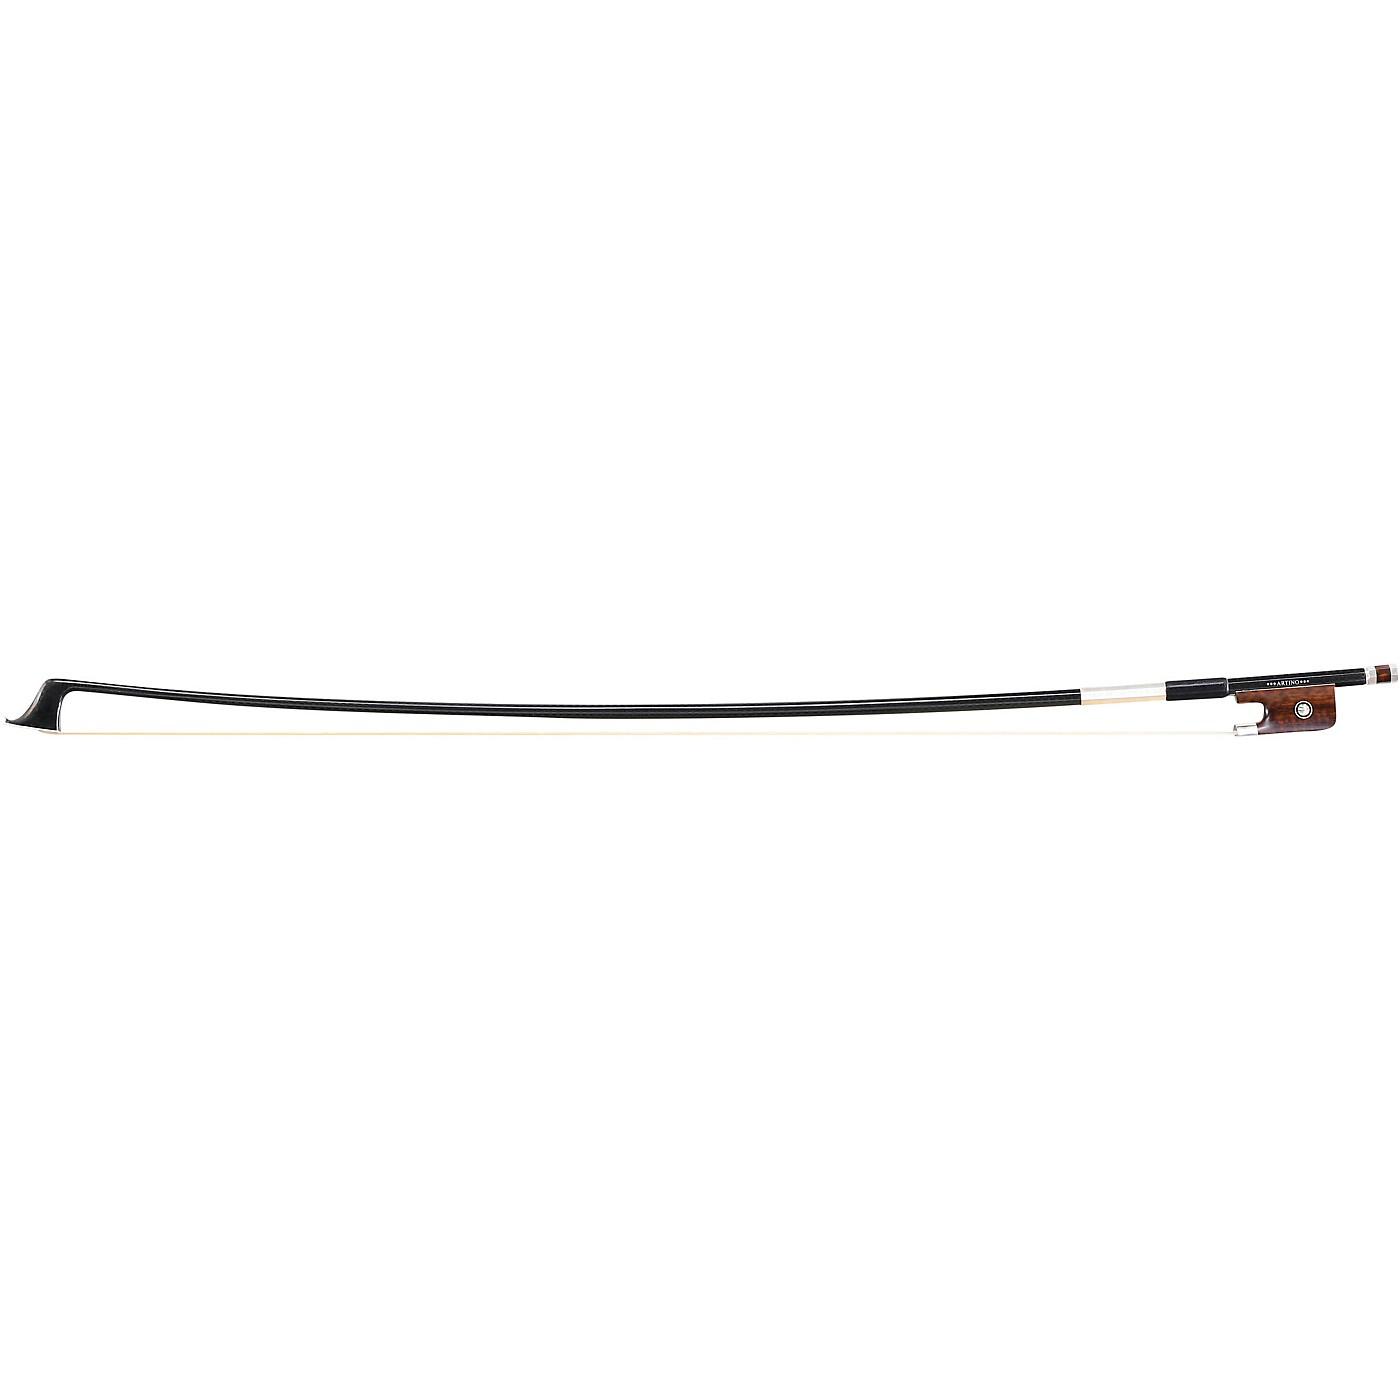 Artino Three Star Deluxe Carbon Fiber Cello Bow thumbnail